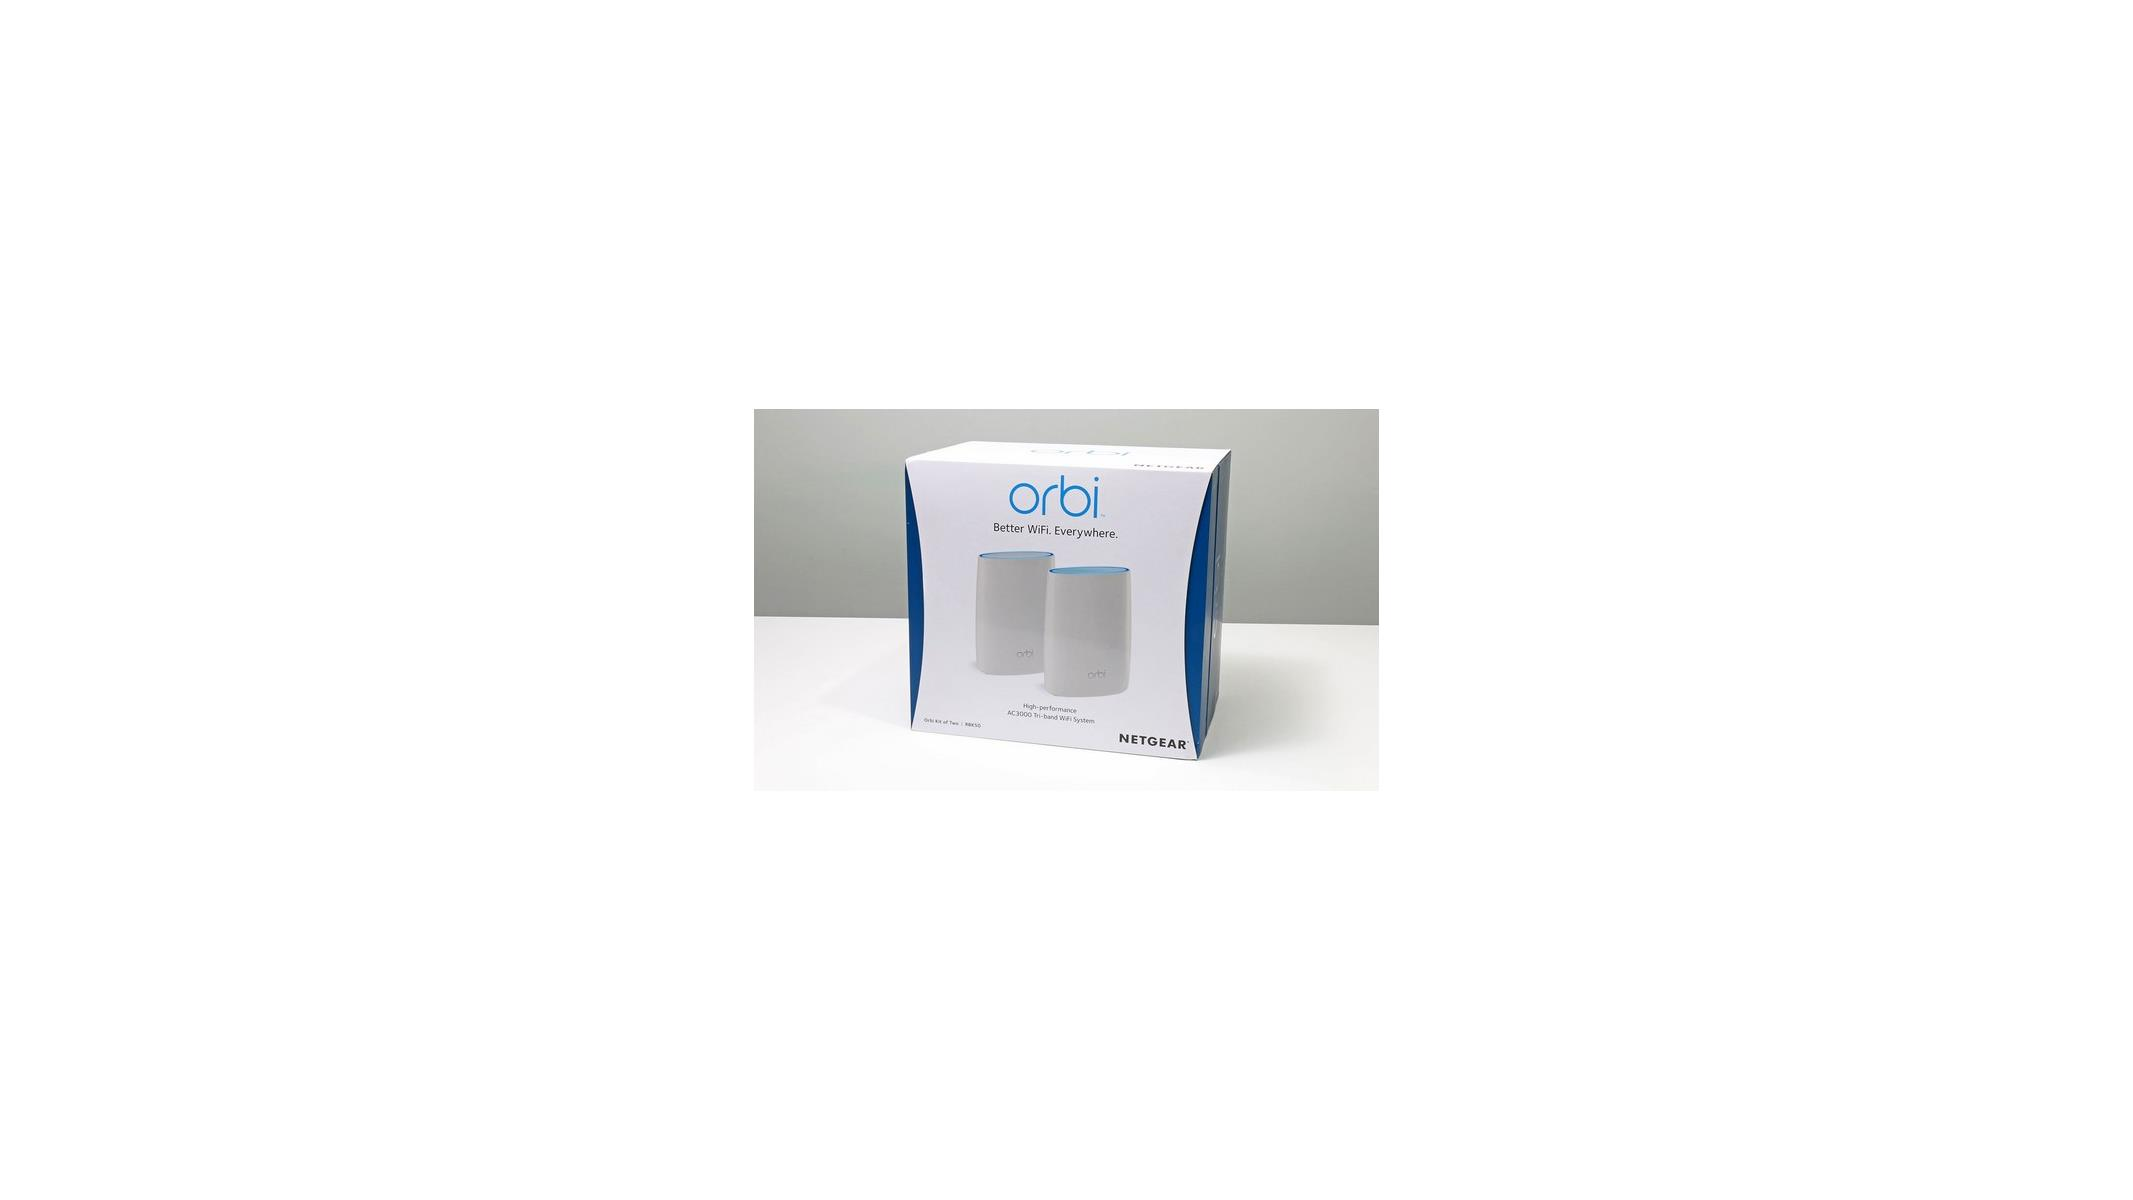 Netgear Orbi AC3000 Mesh WiFi System Review - Page 2